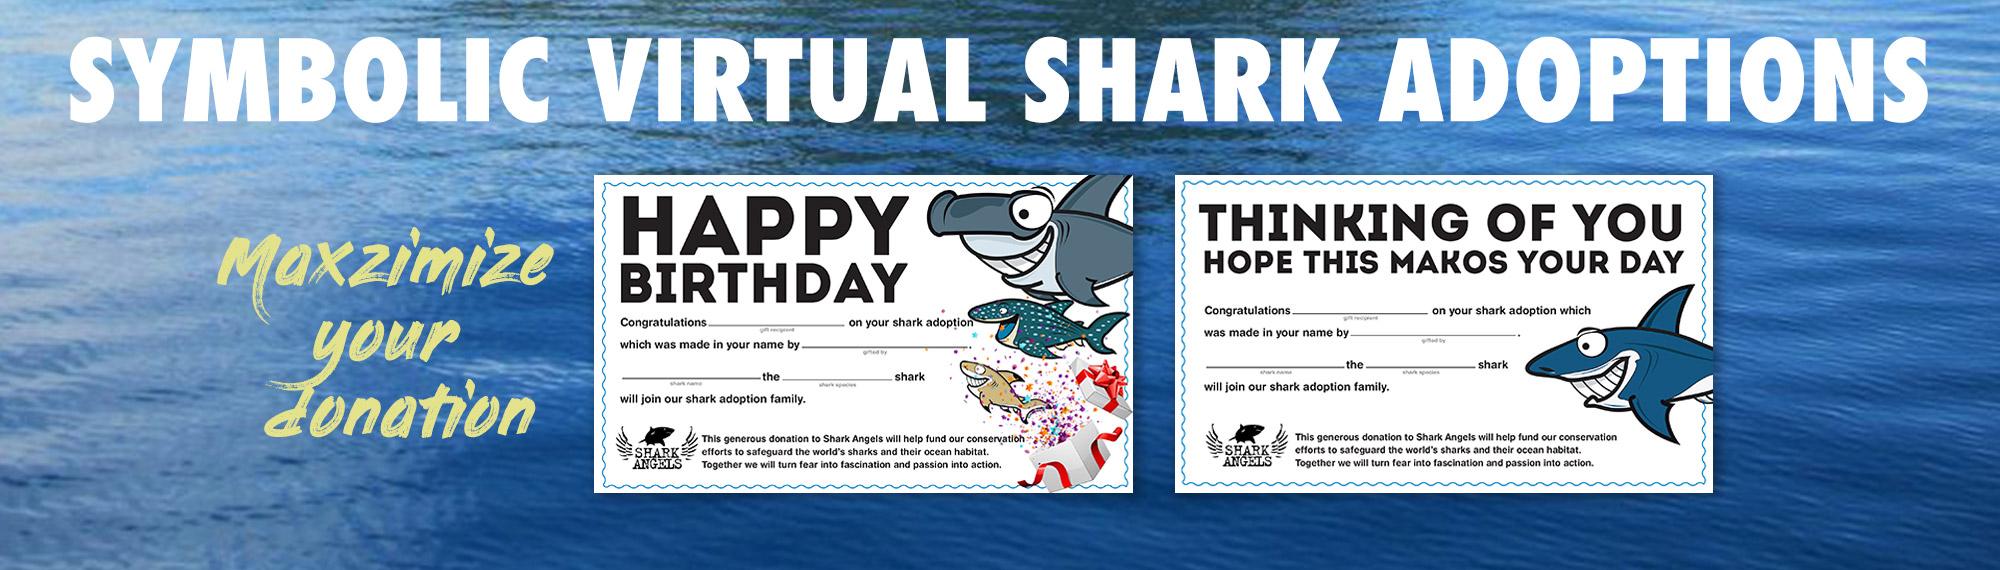 category-banner-virtual-shark-adoptions.jpg